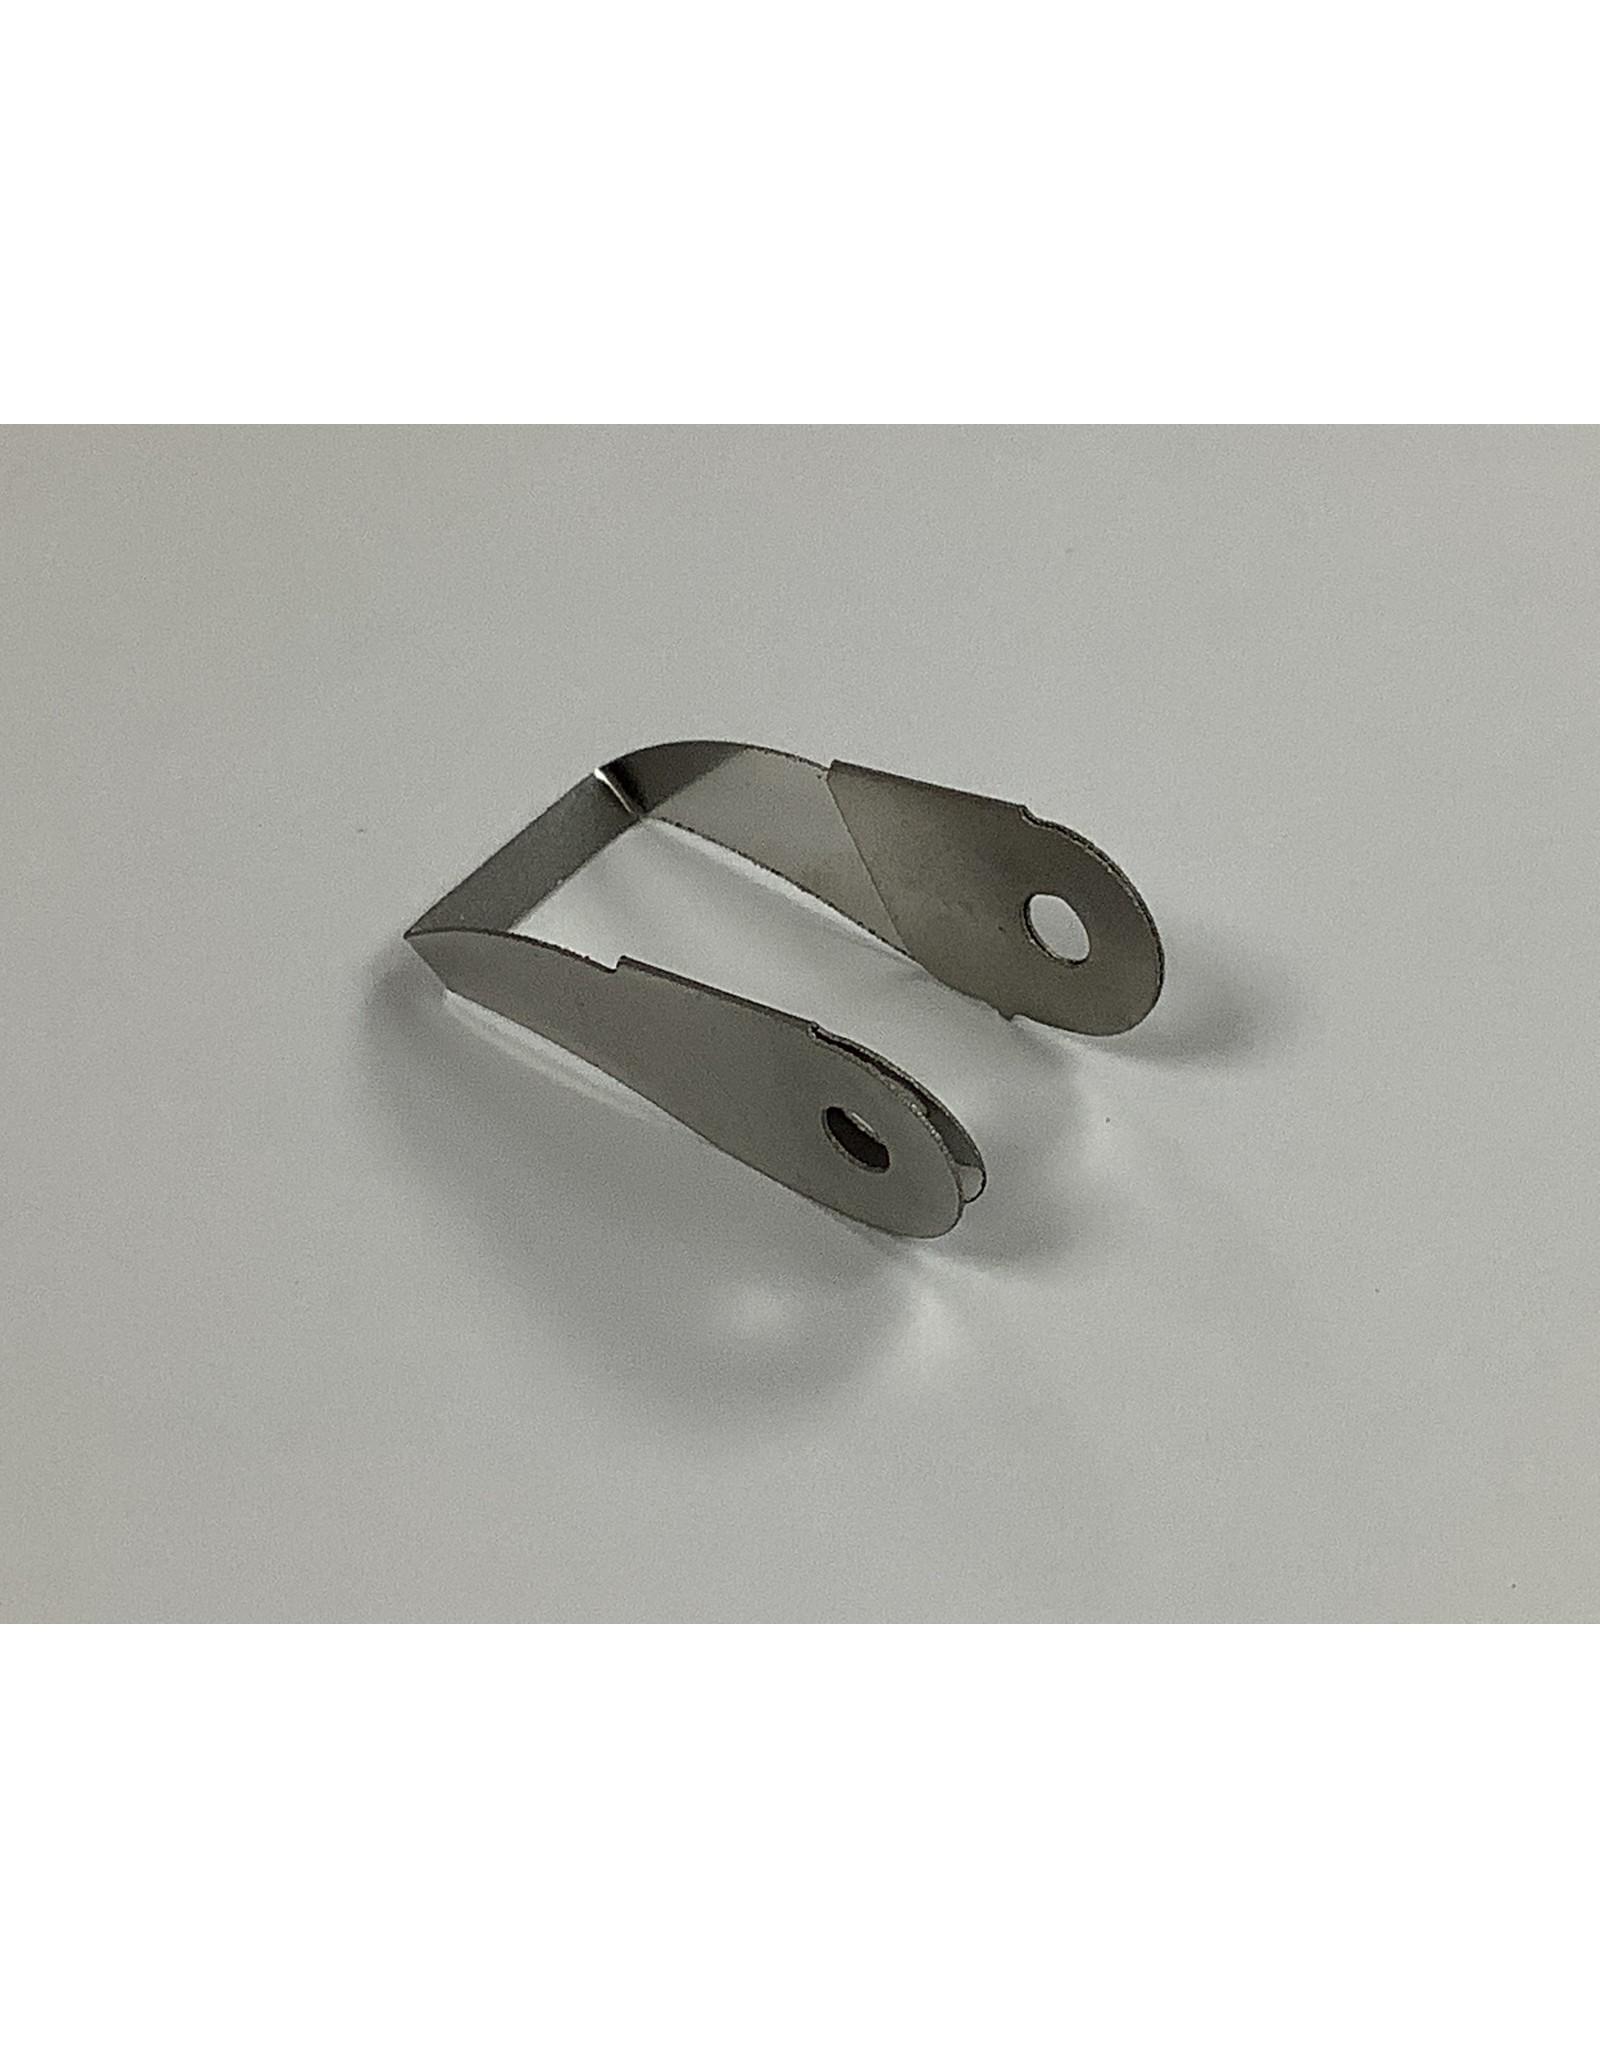 Diamondcore Tools Curved Square tip 12mm (P23) spare blade